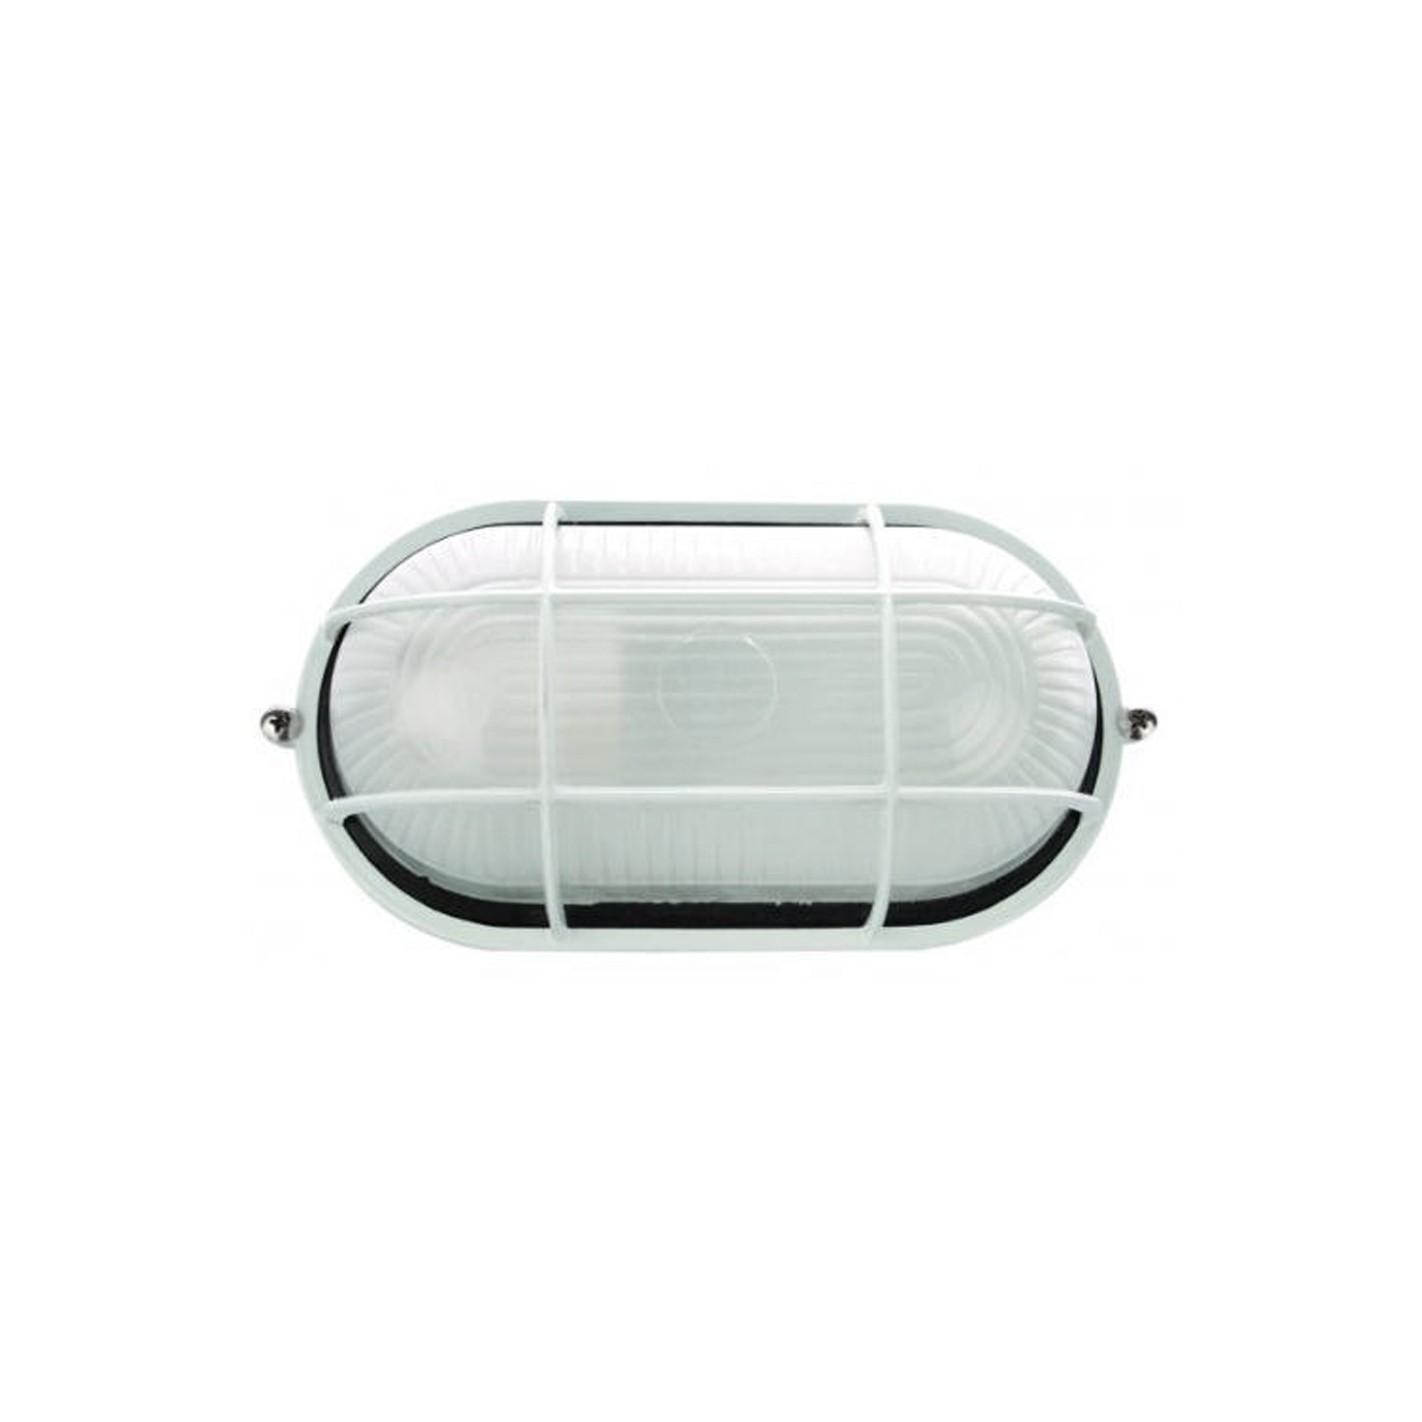 Plaf n de exterior cl sico de aluminio ovalado alg sistemas for Plafones exterior iluminacion